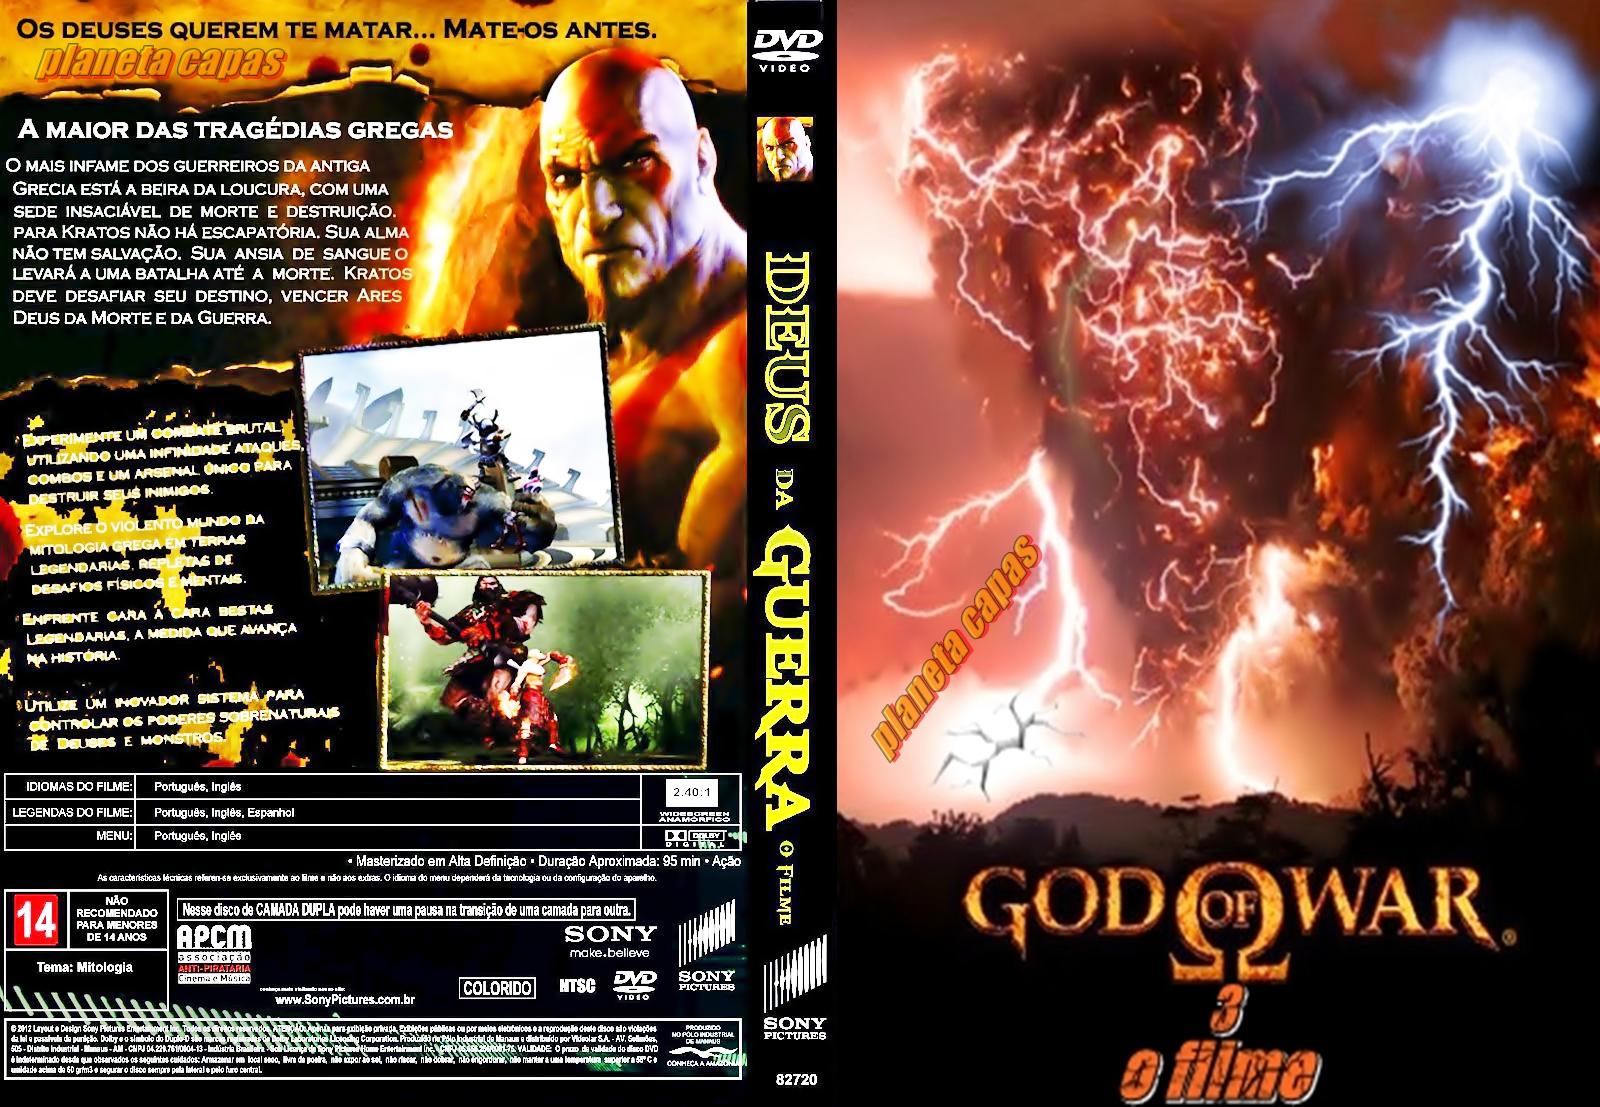 Dvd God of War 3 God of War 3 o Filme Deus da